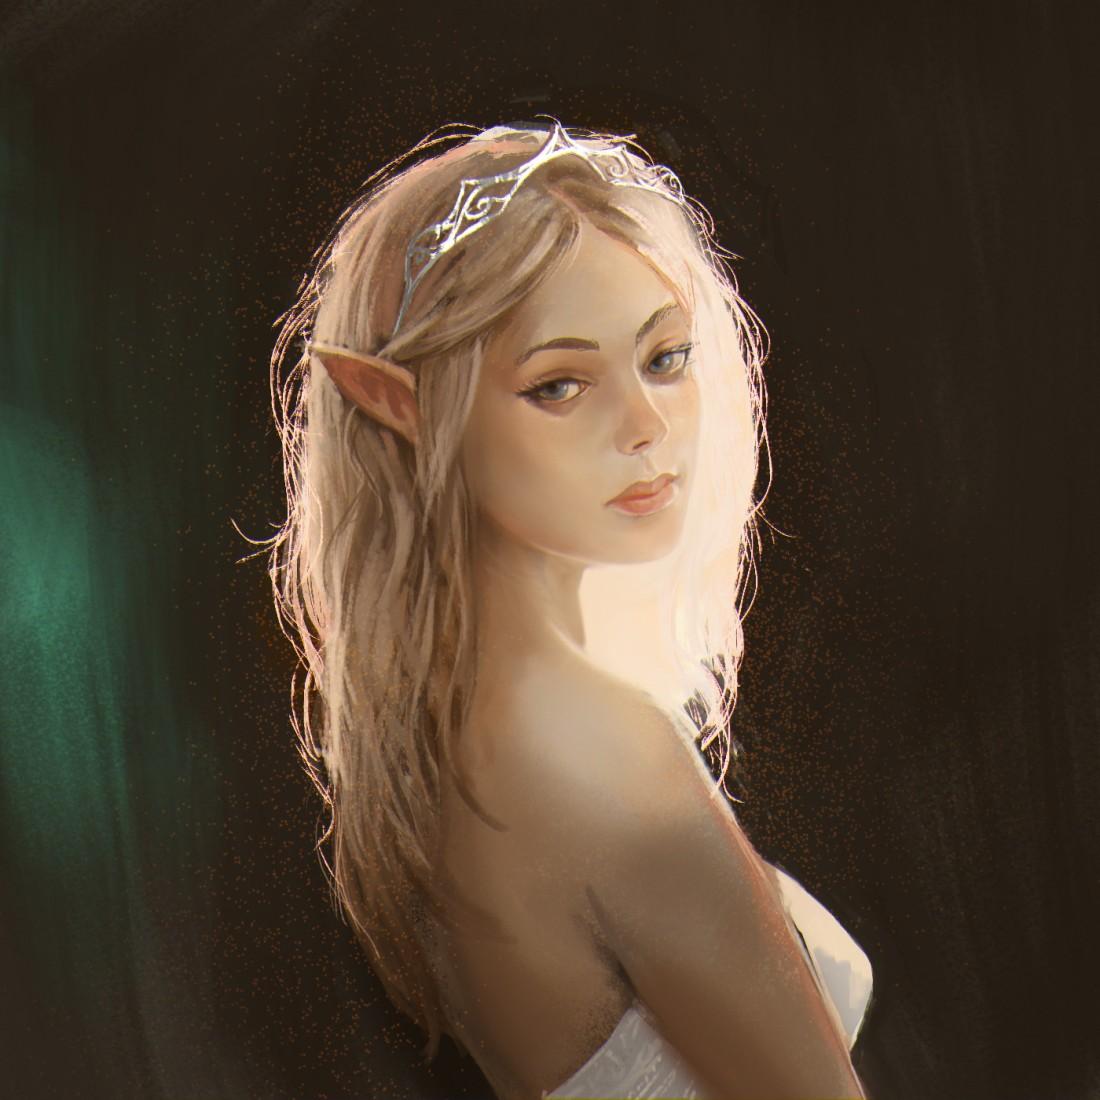 elf_girl_by_yoggurt_dc104wx